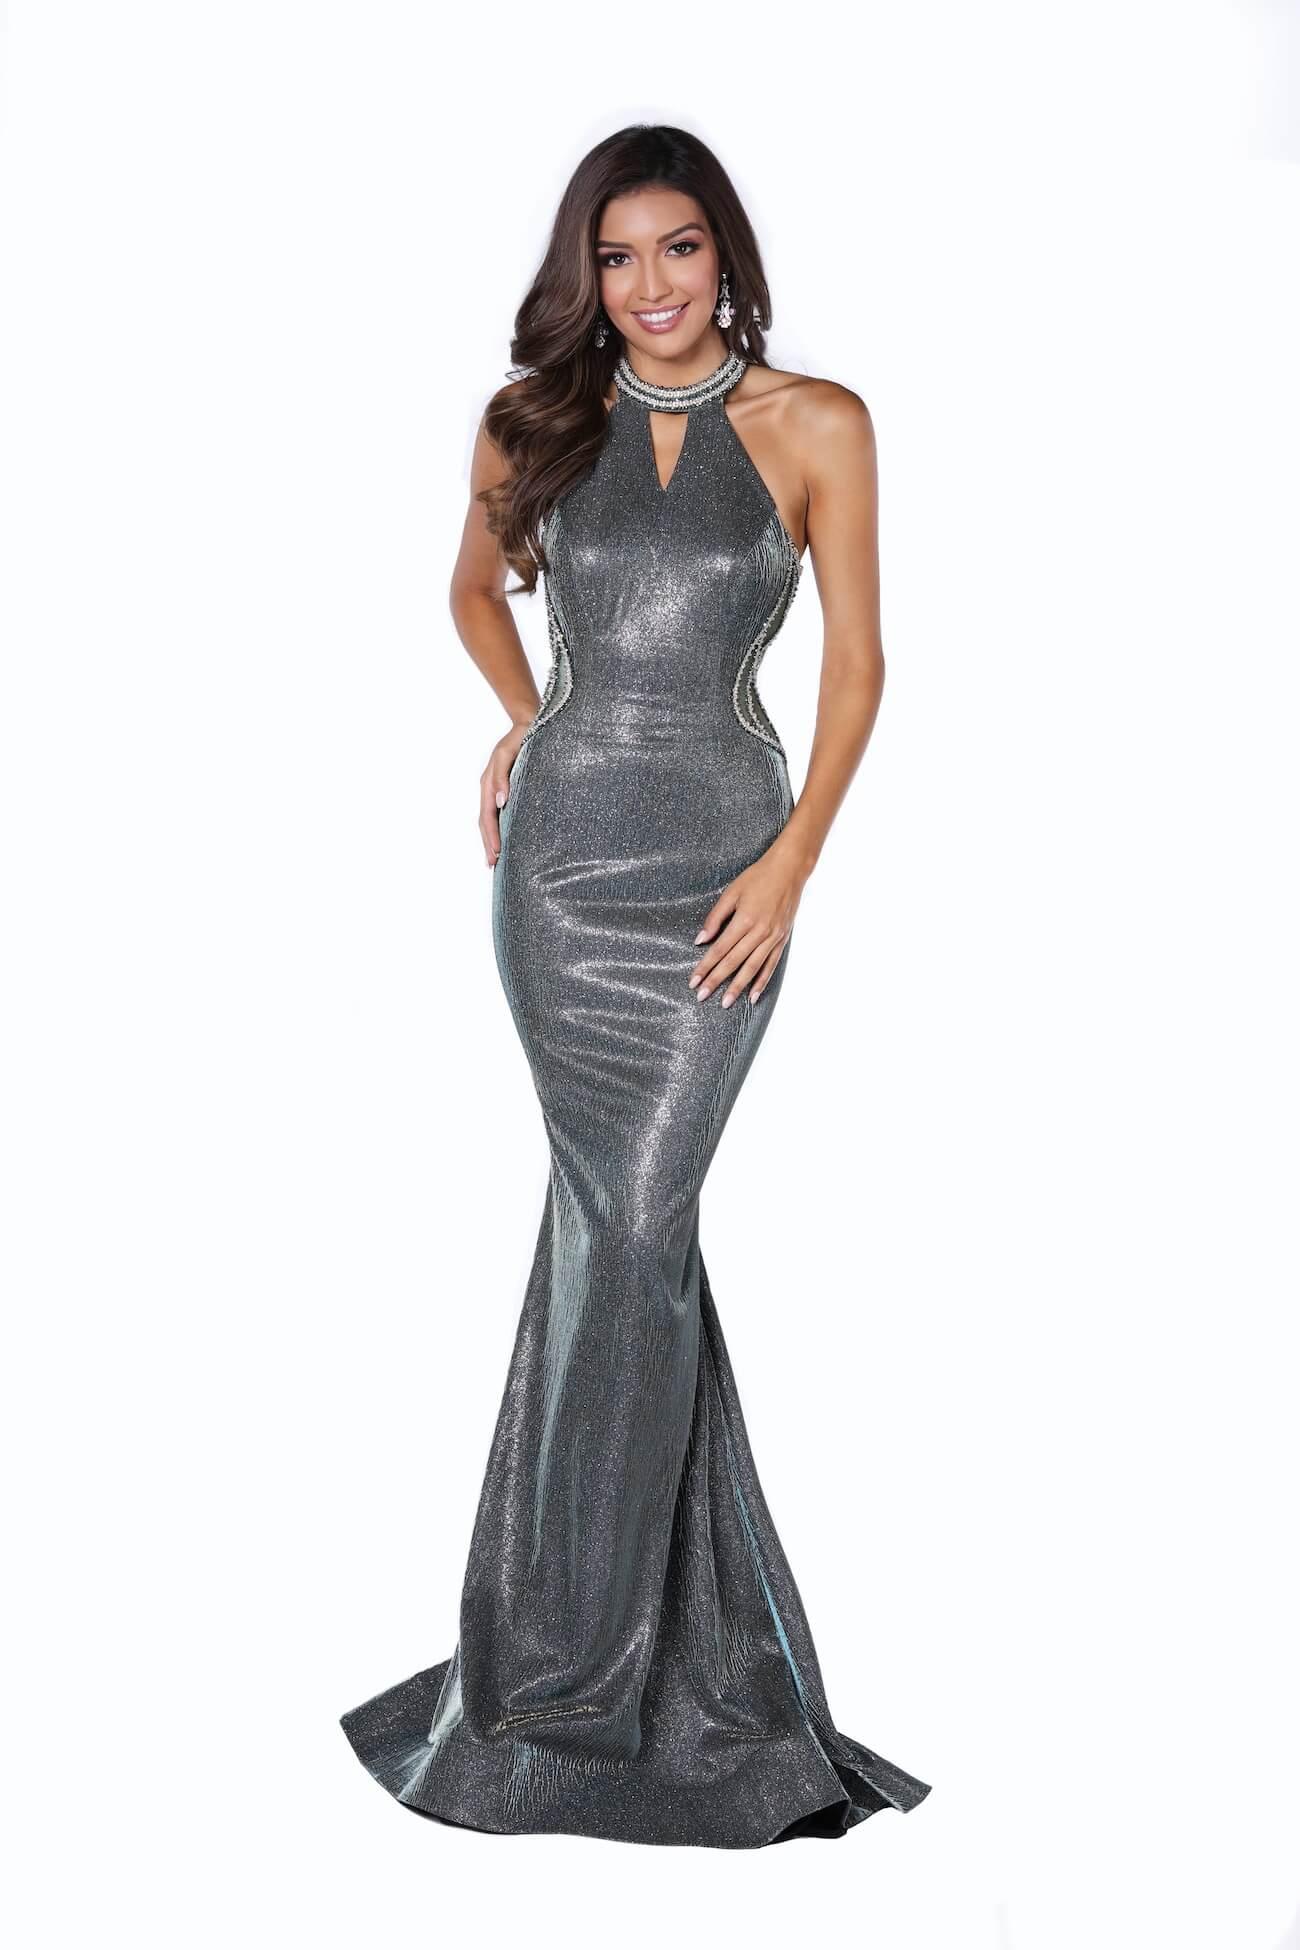 Queenly size 10 Vienna Silver Mermaid evening gown/formal dress